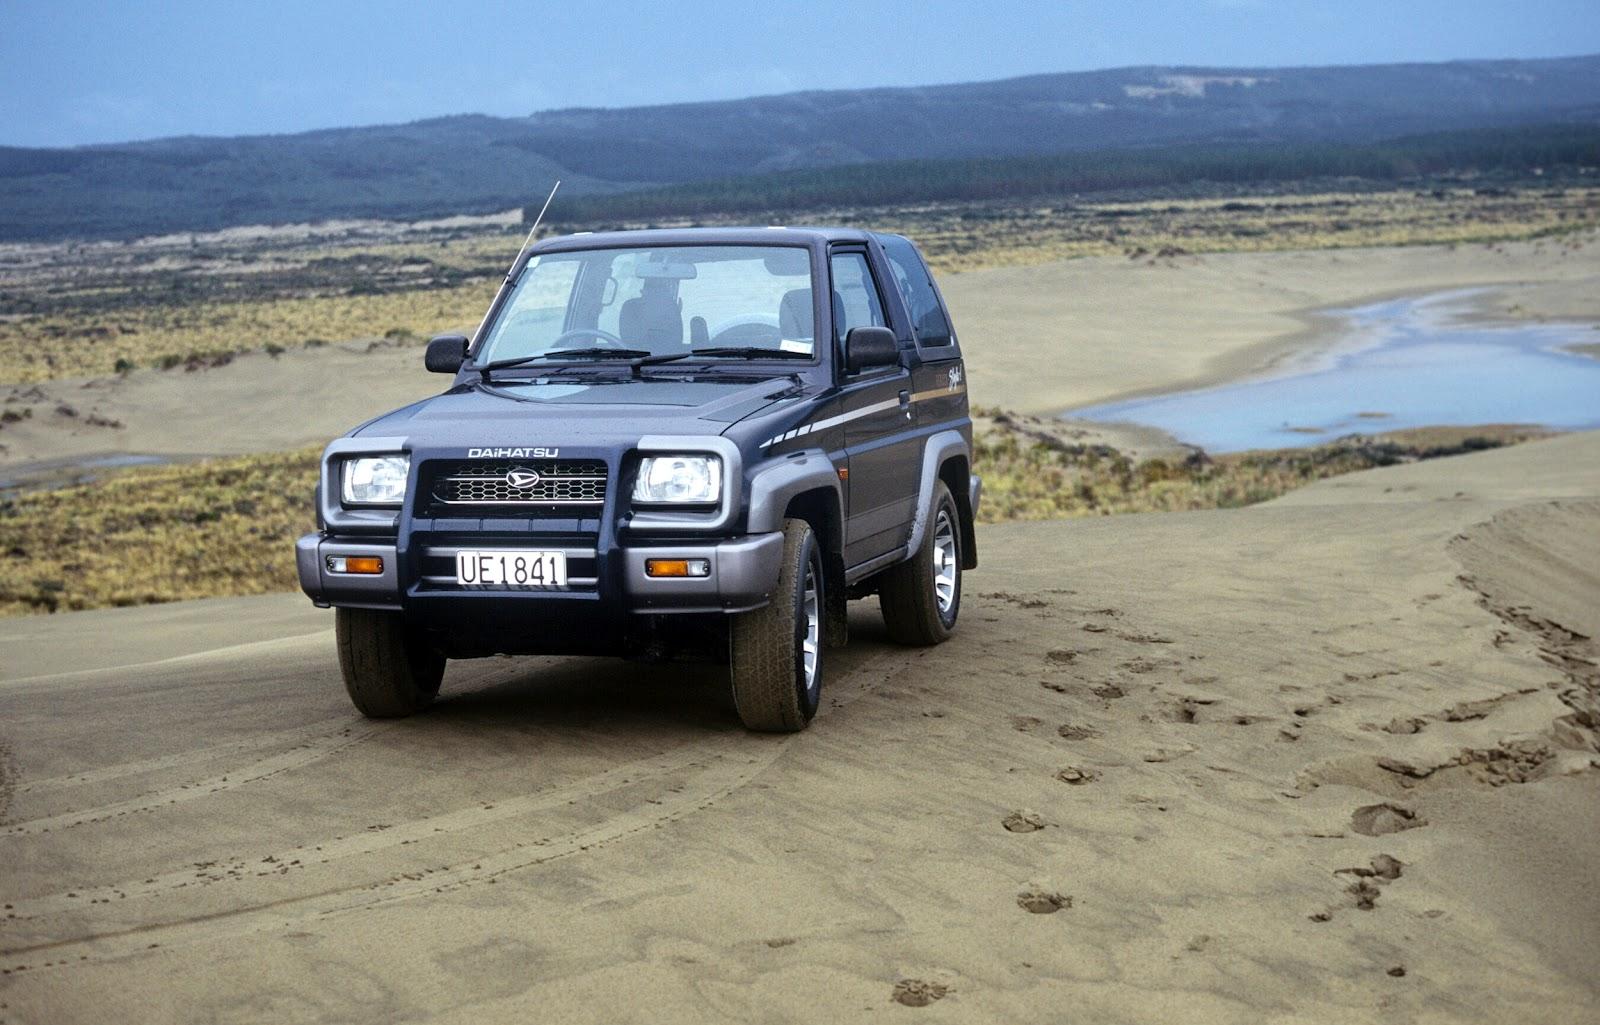 4WD Newz: Daihatsu Feroza: Not A Bad Little Truck